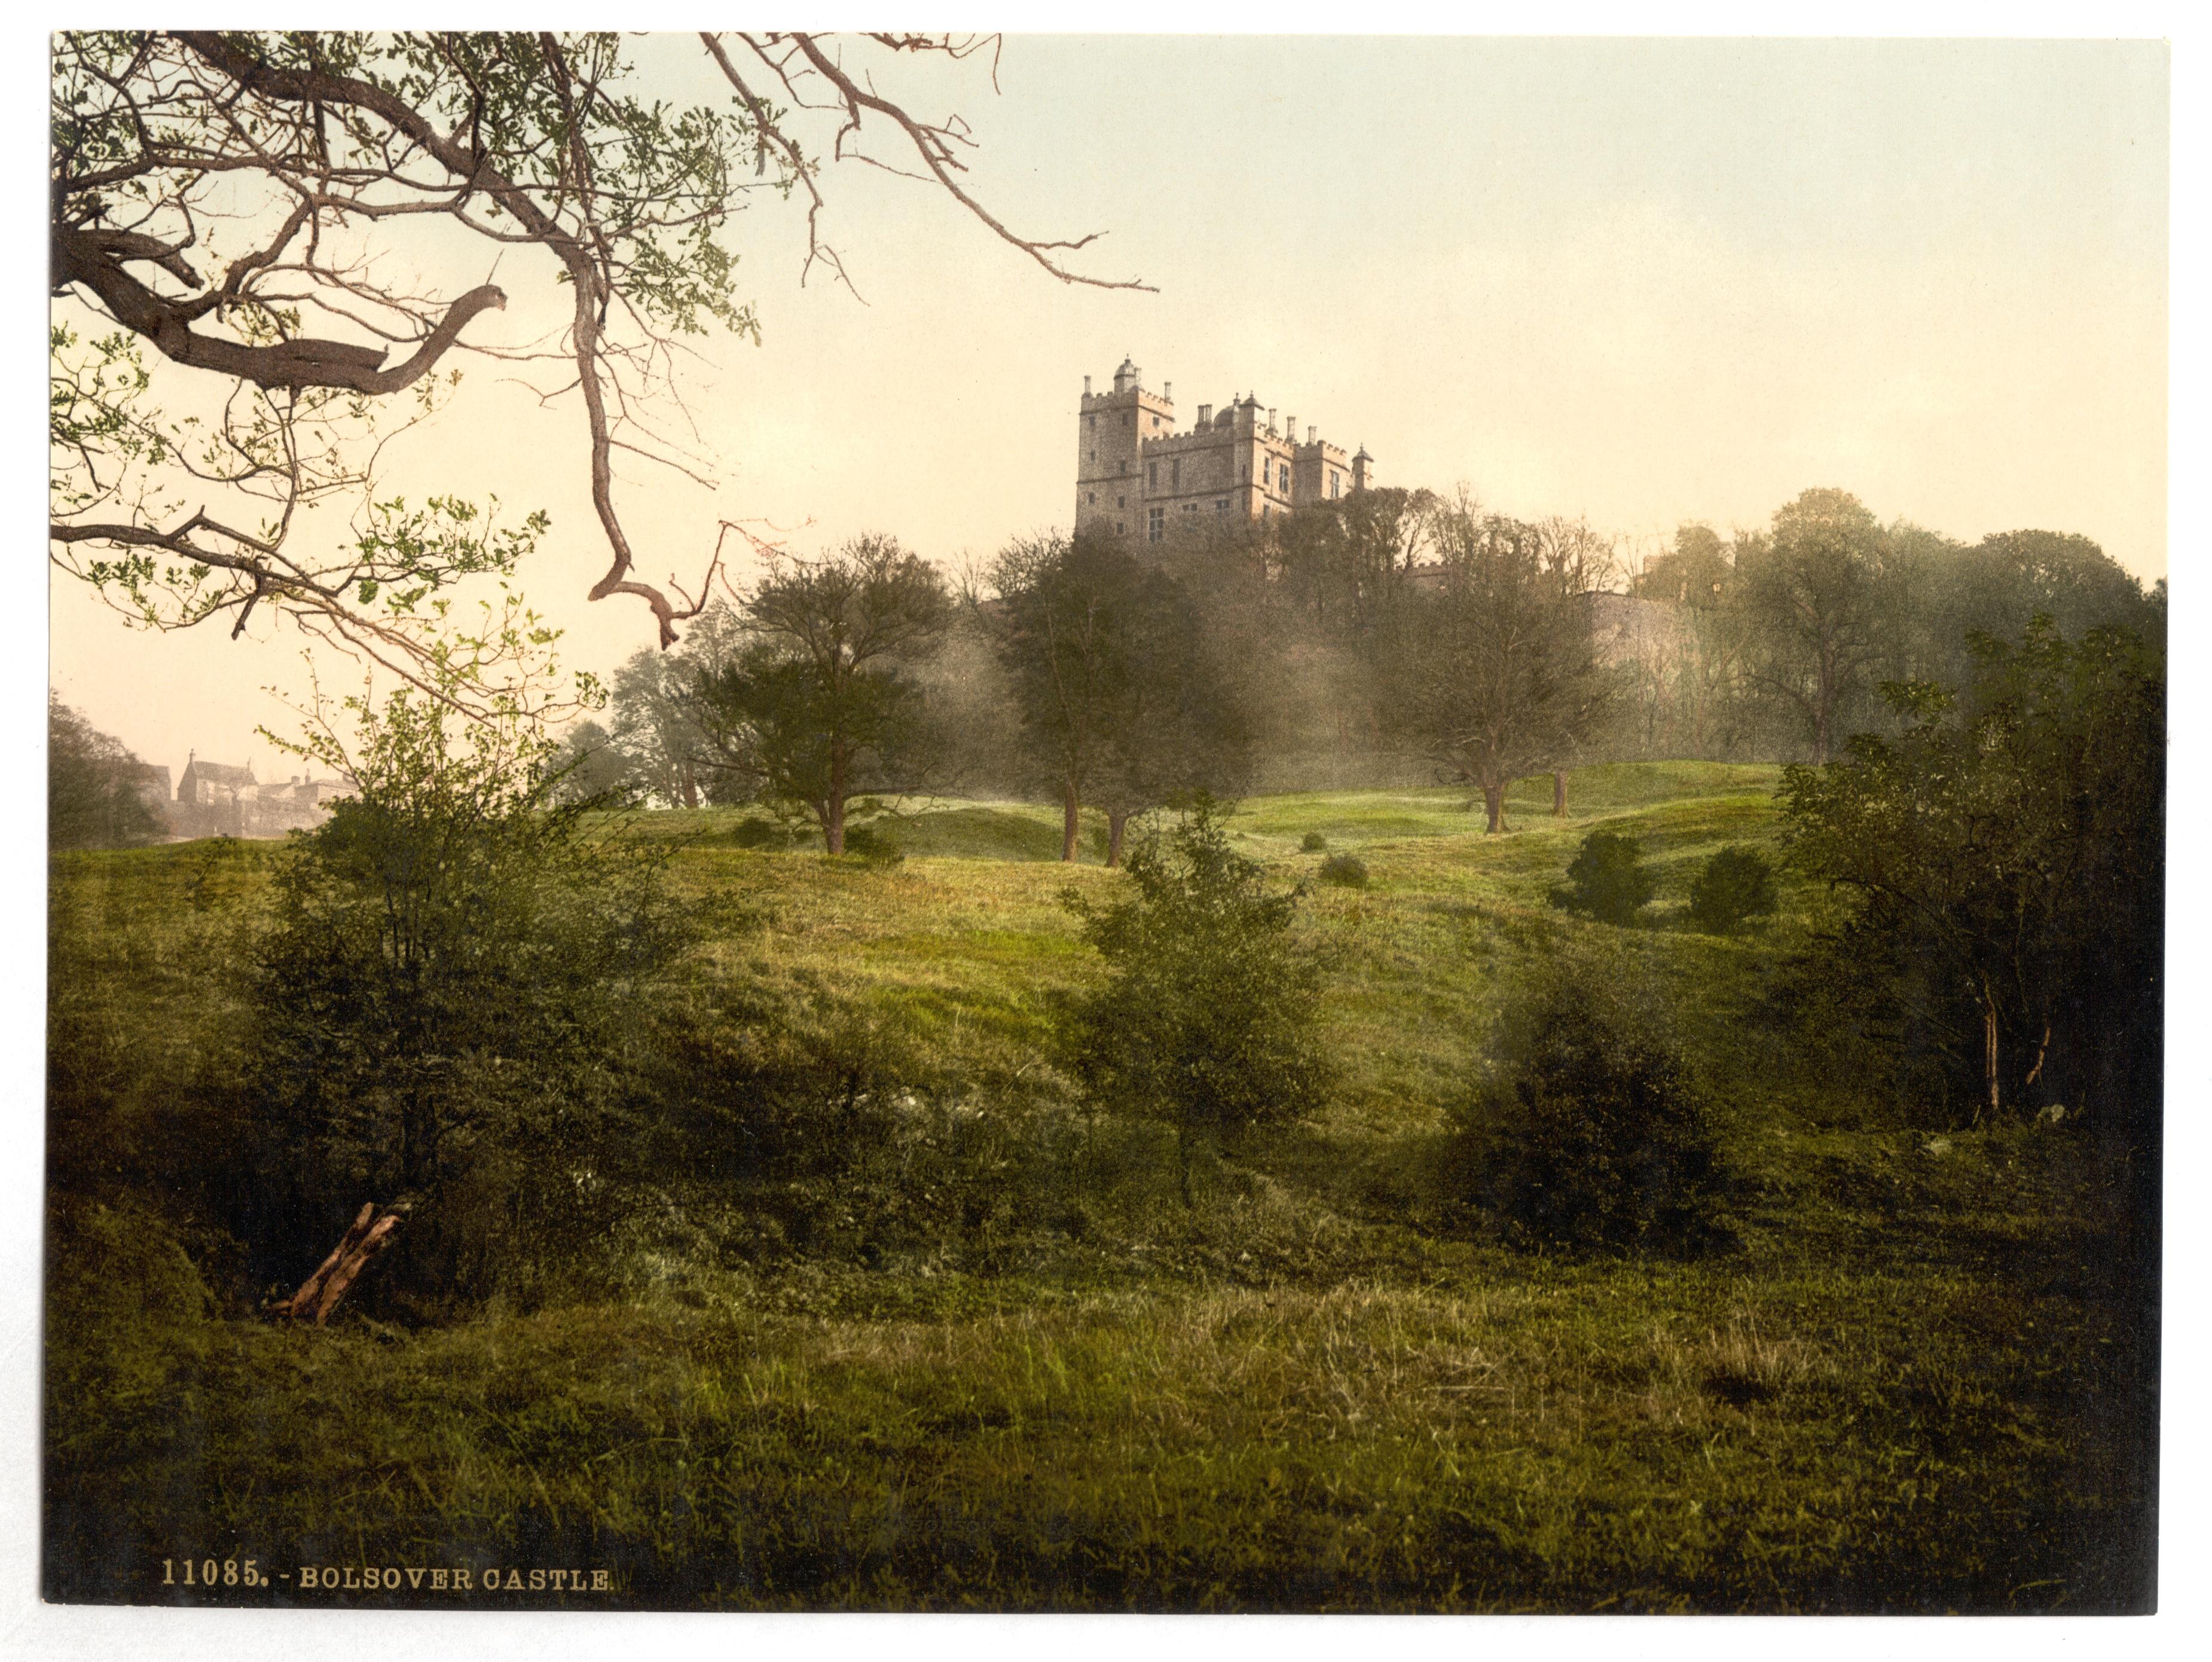 Best Castles In England: Bolsover Castle